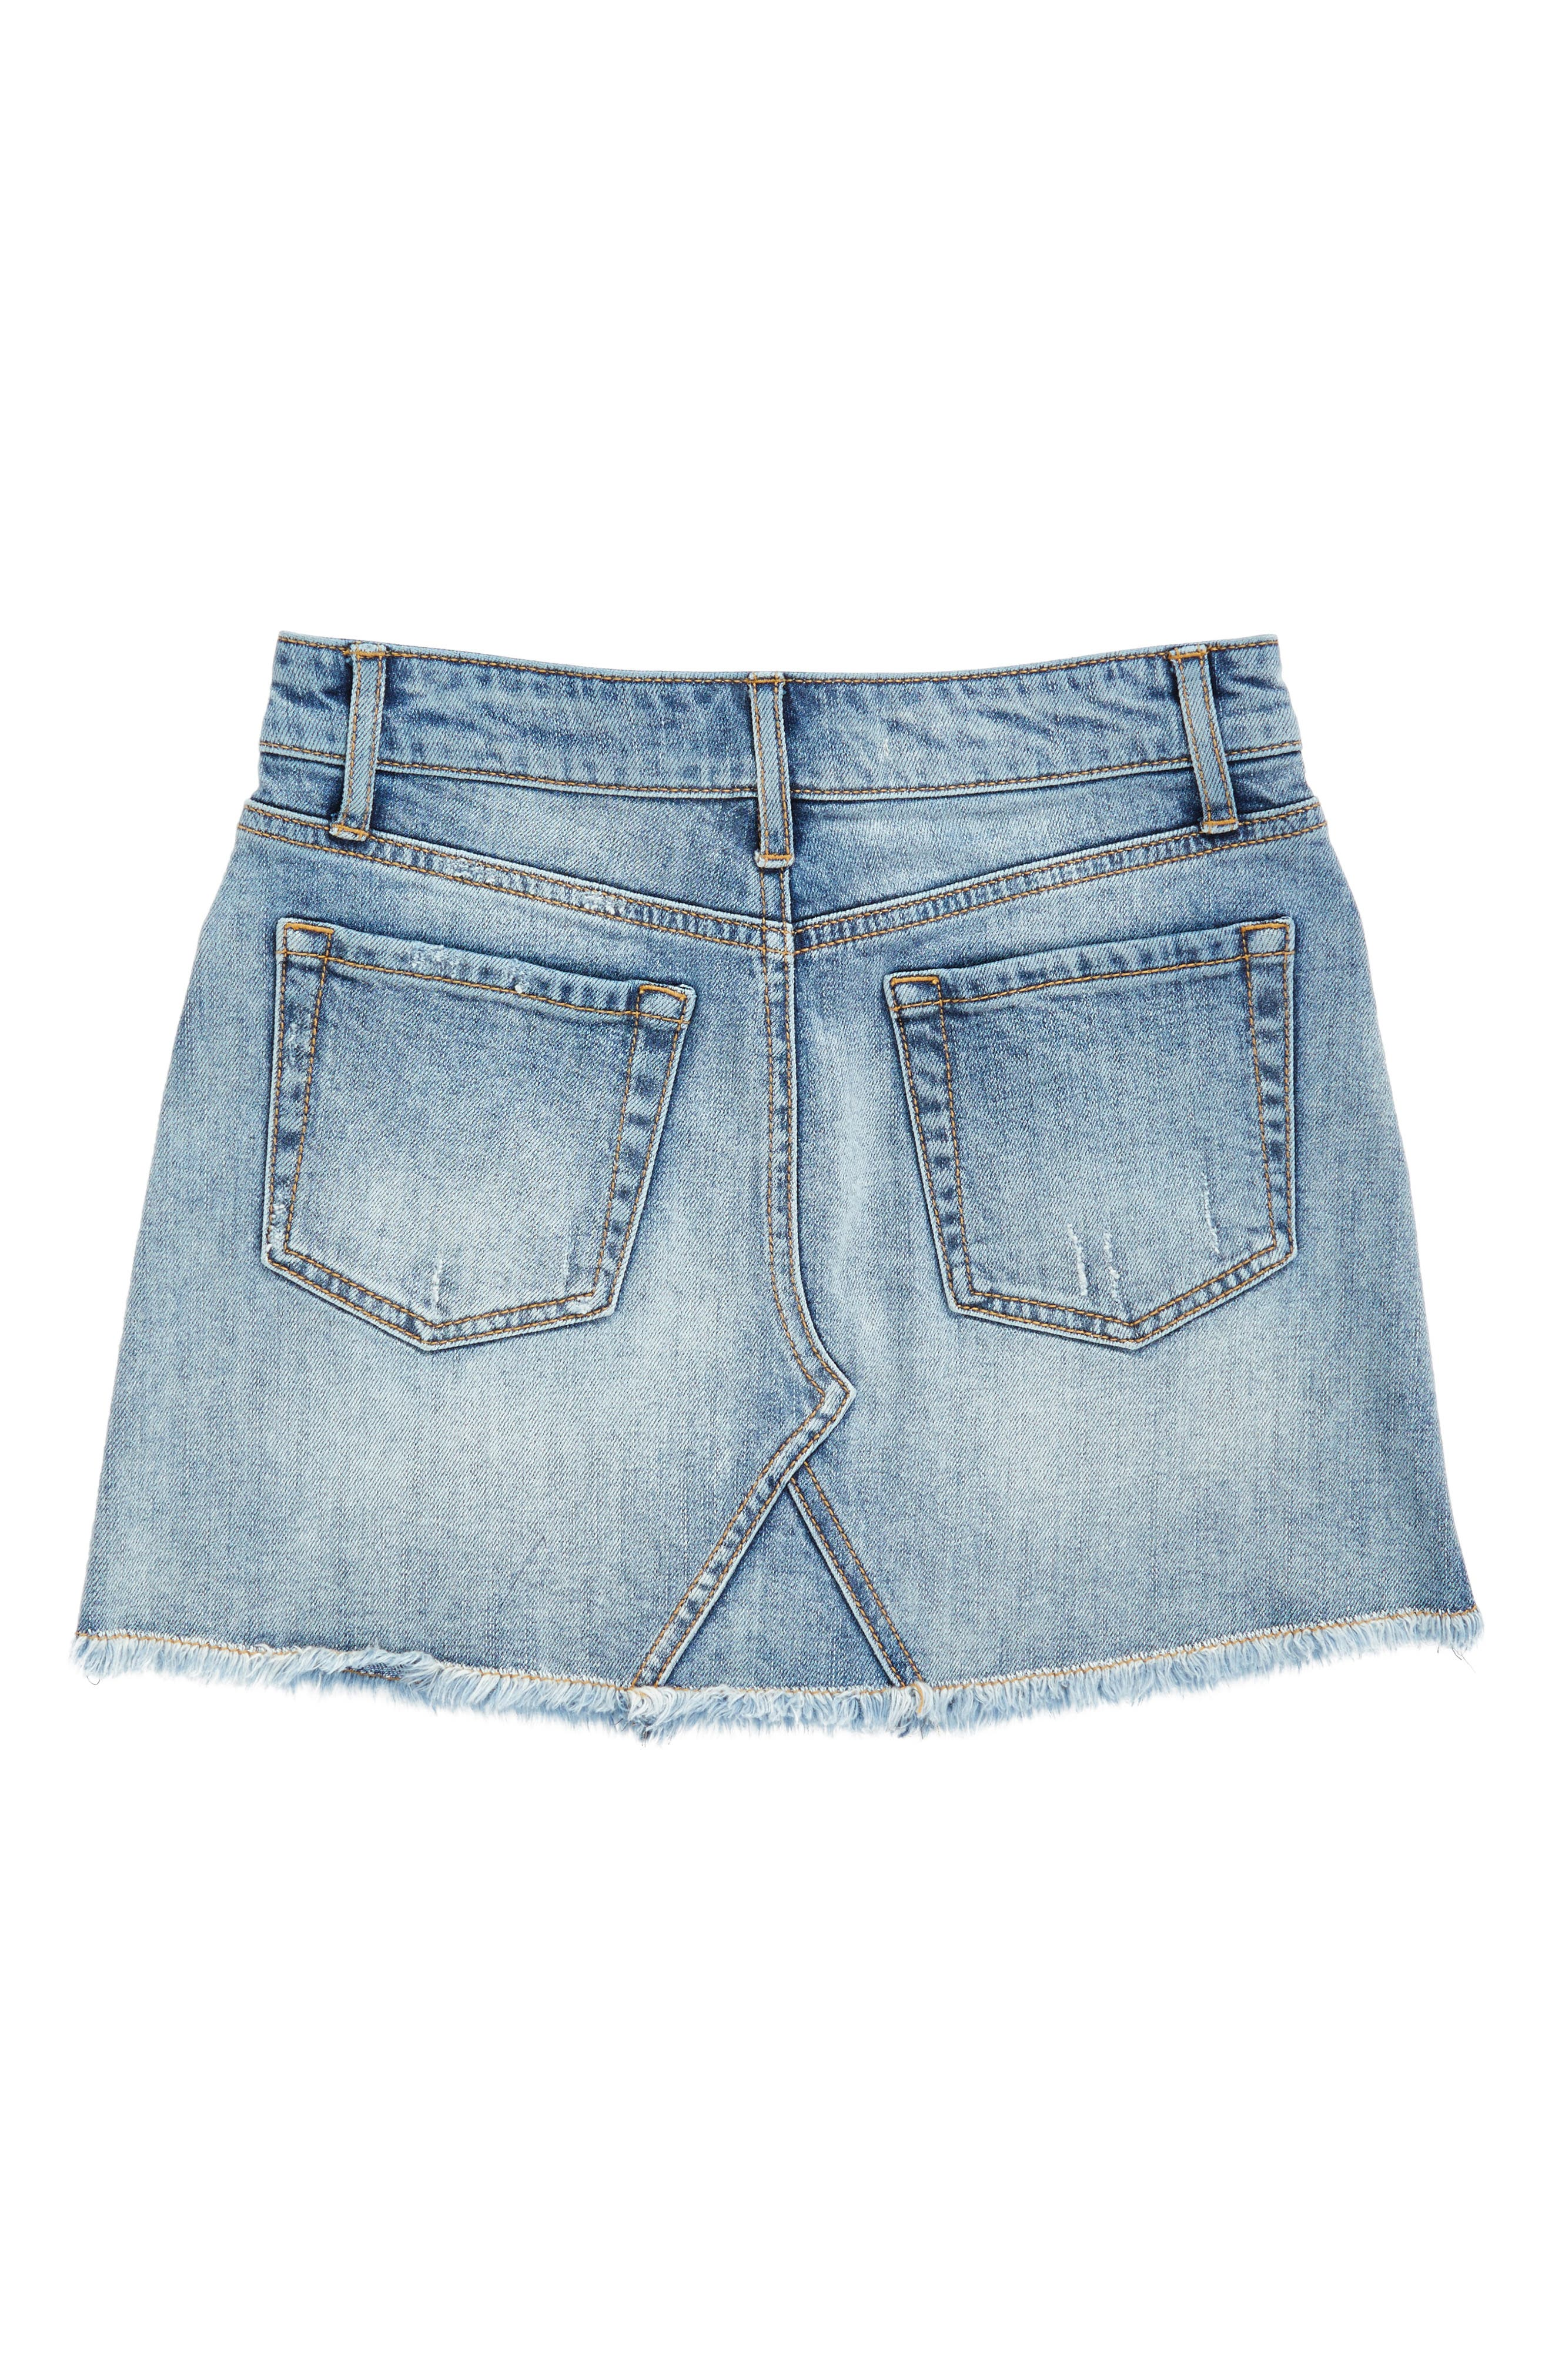 Cutoff Denim Skirt,                             Alternate thumbnail 2, color,                             420